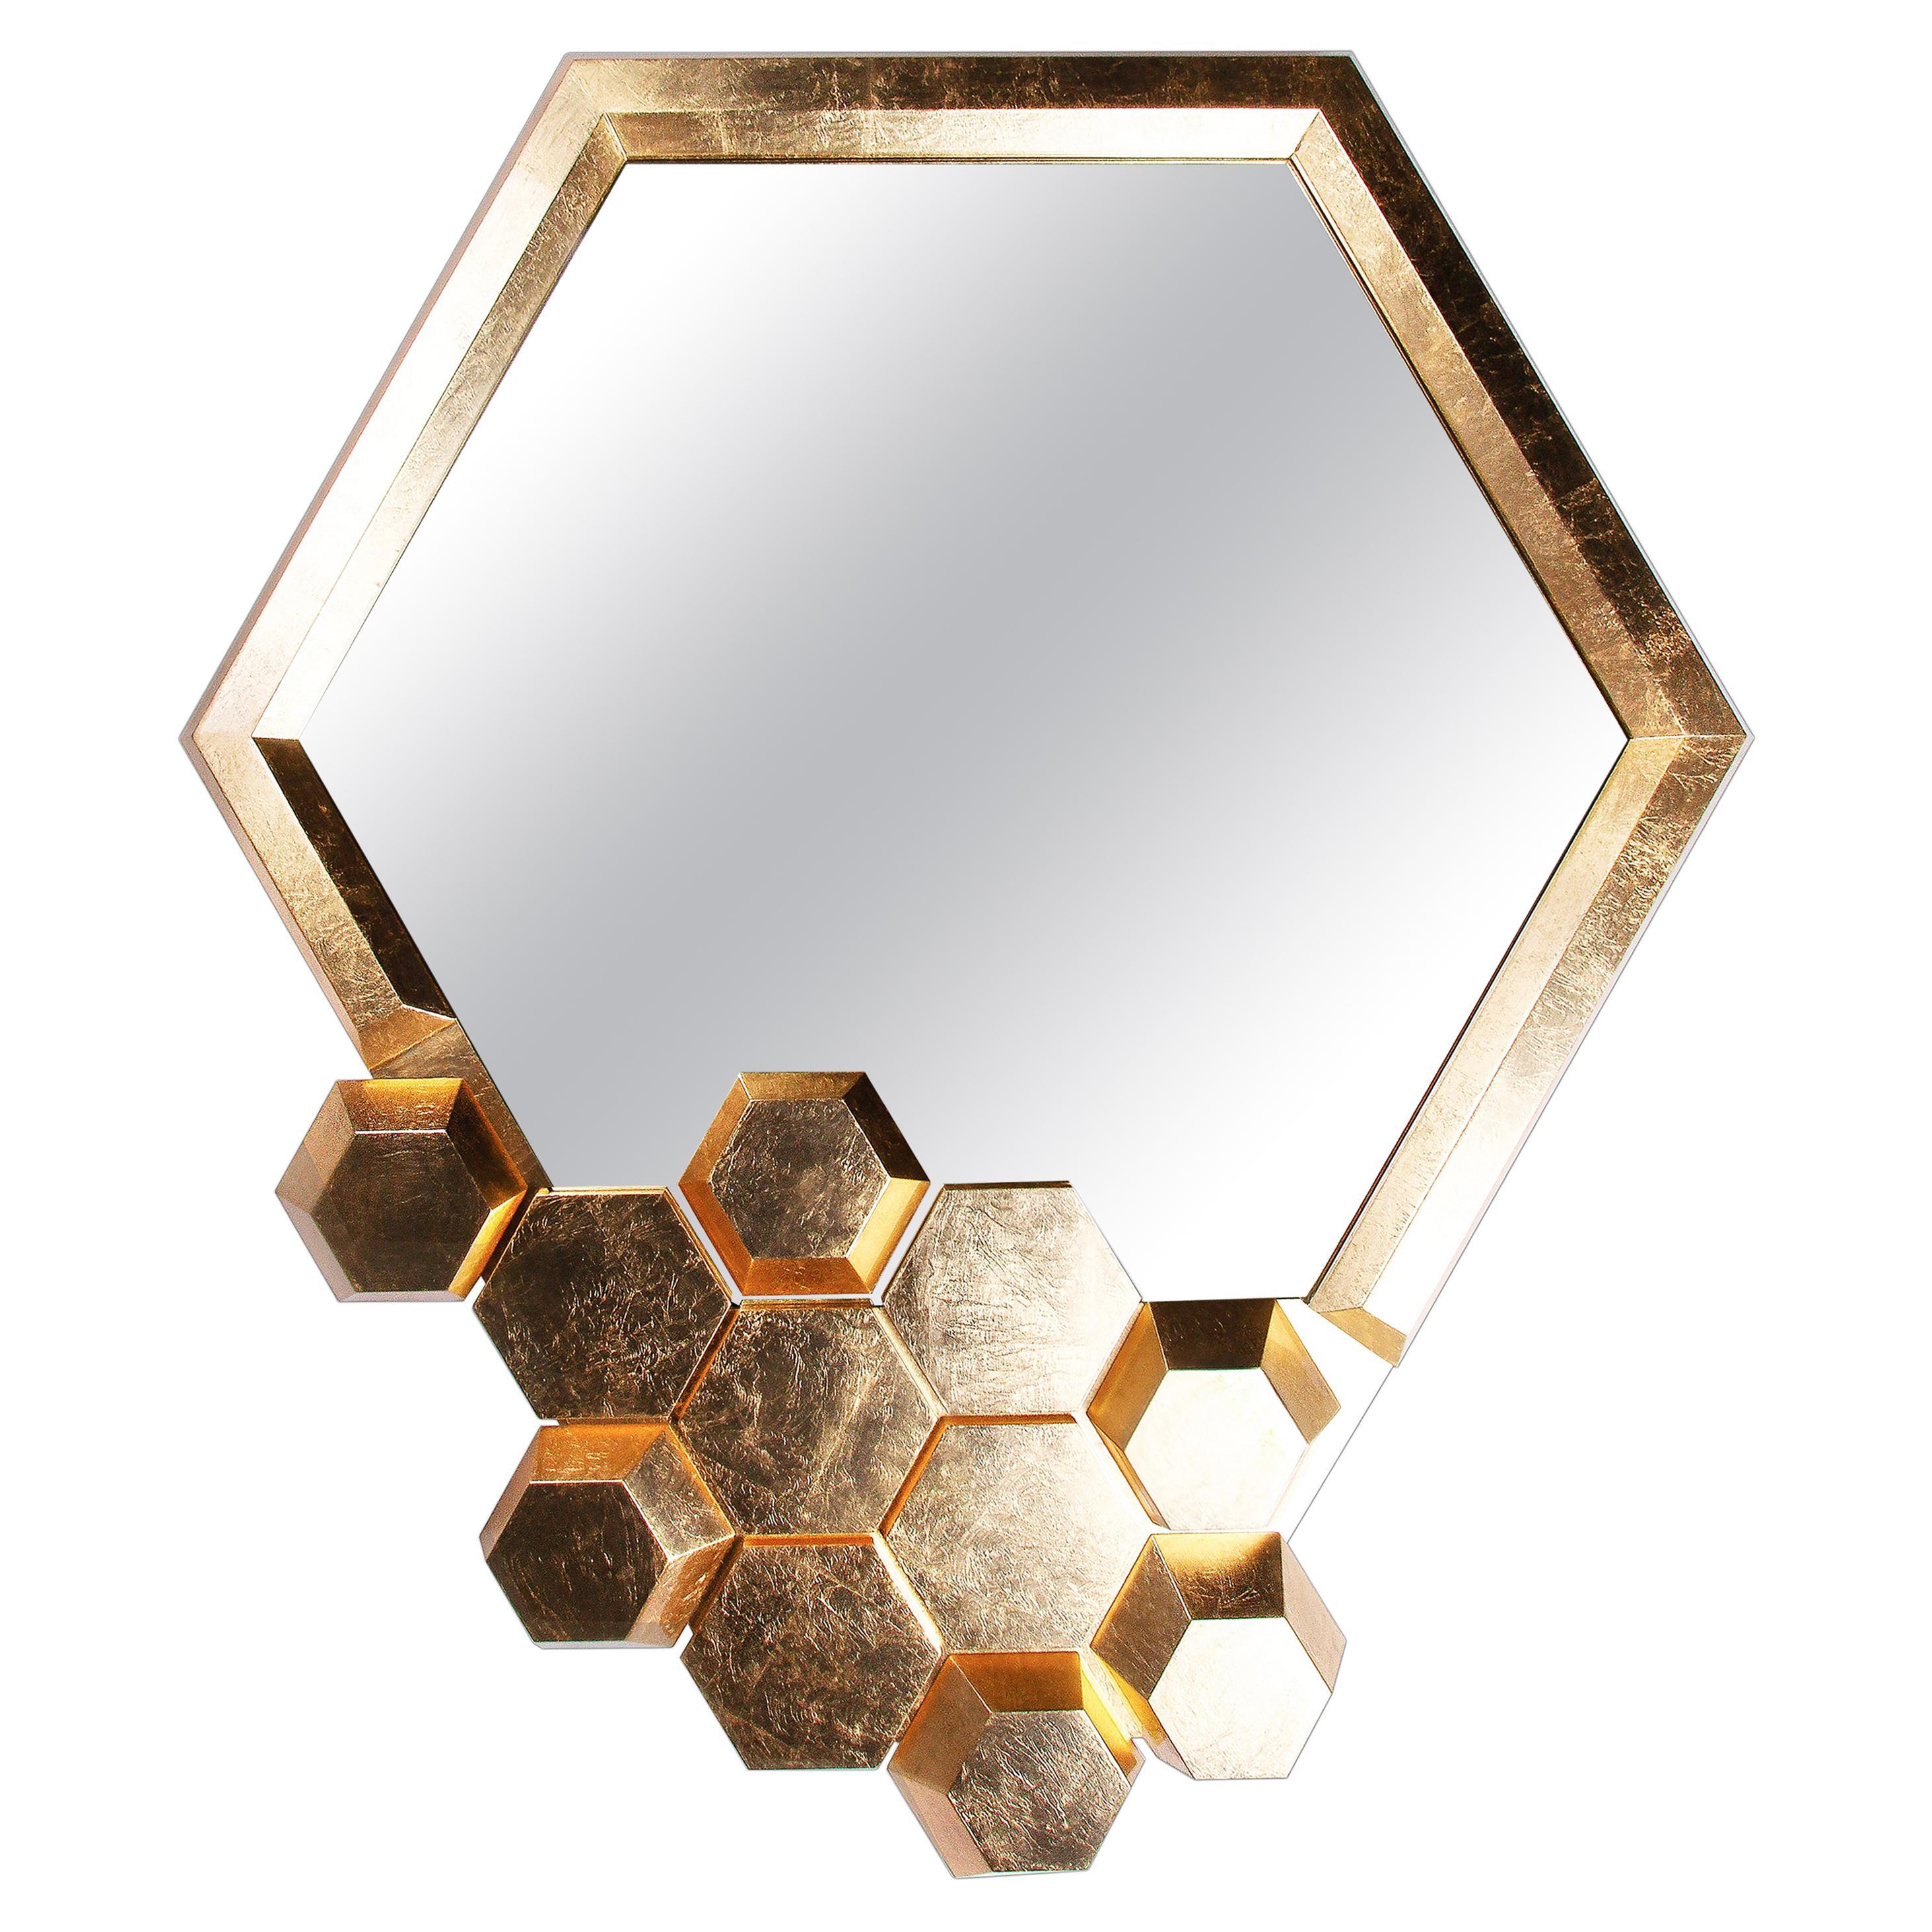 Honeycomb Limited Edition Wall Mirror, Royal Stranger